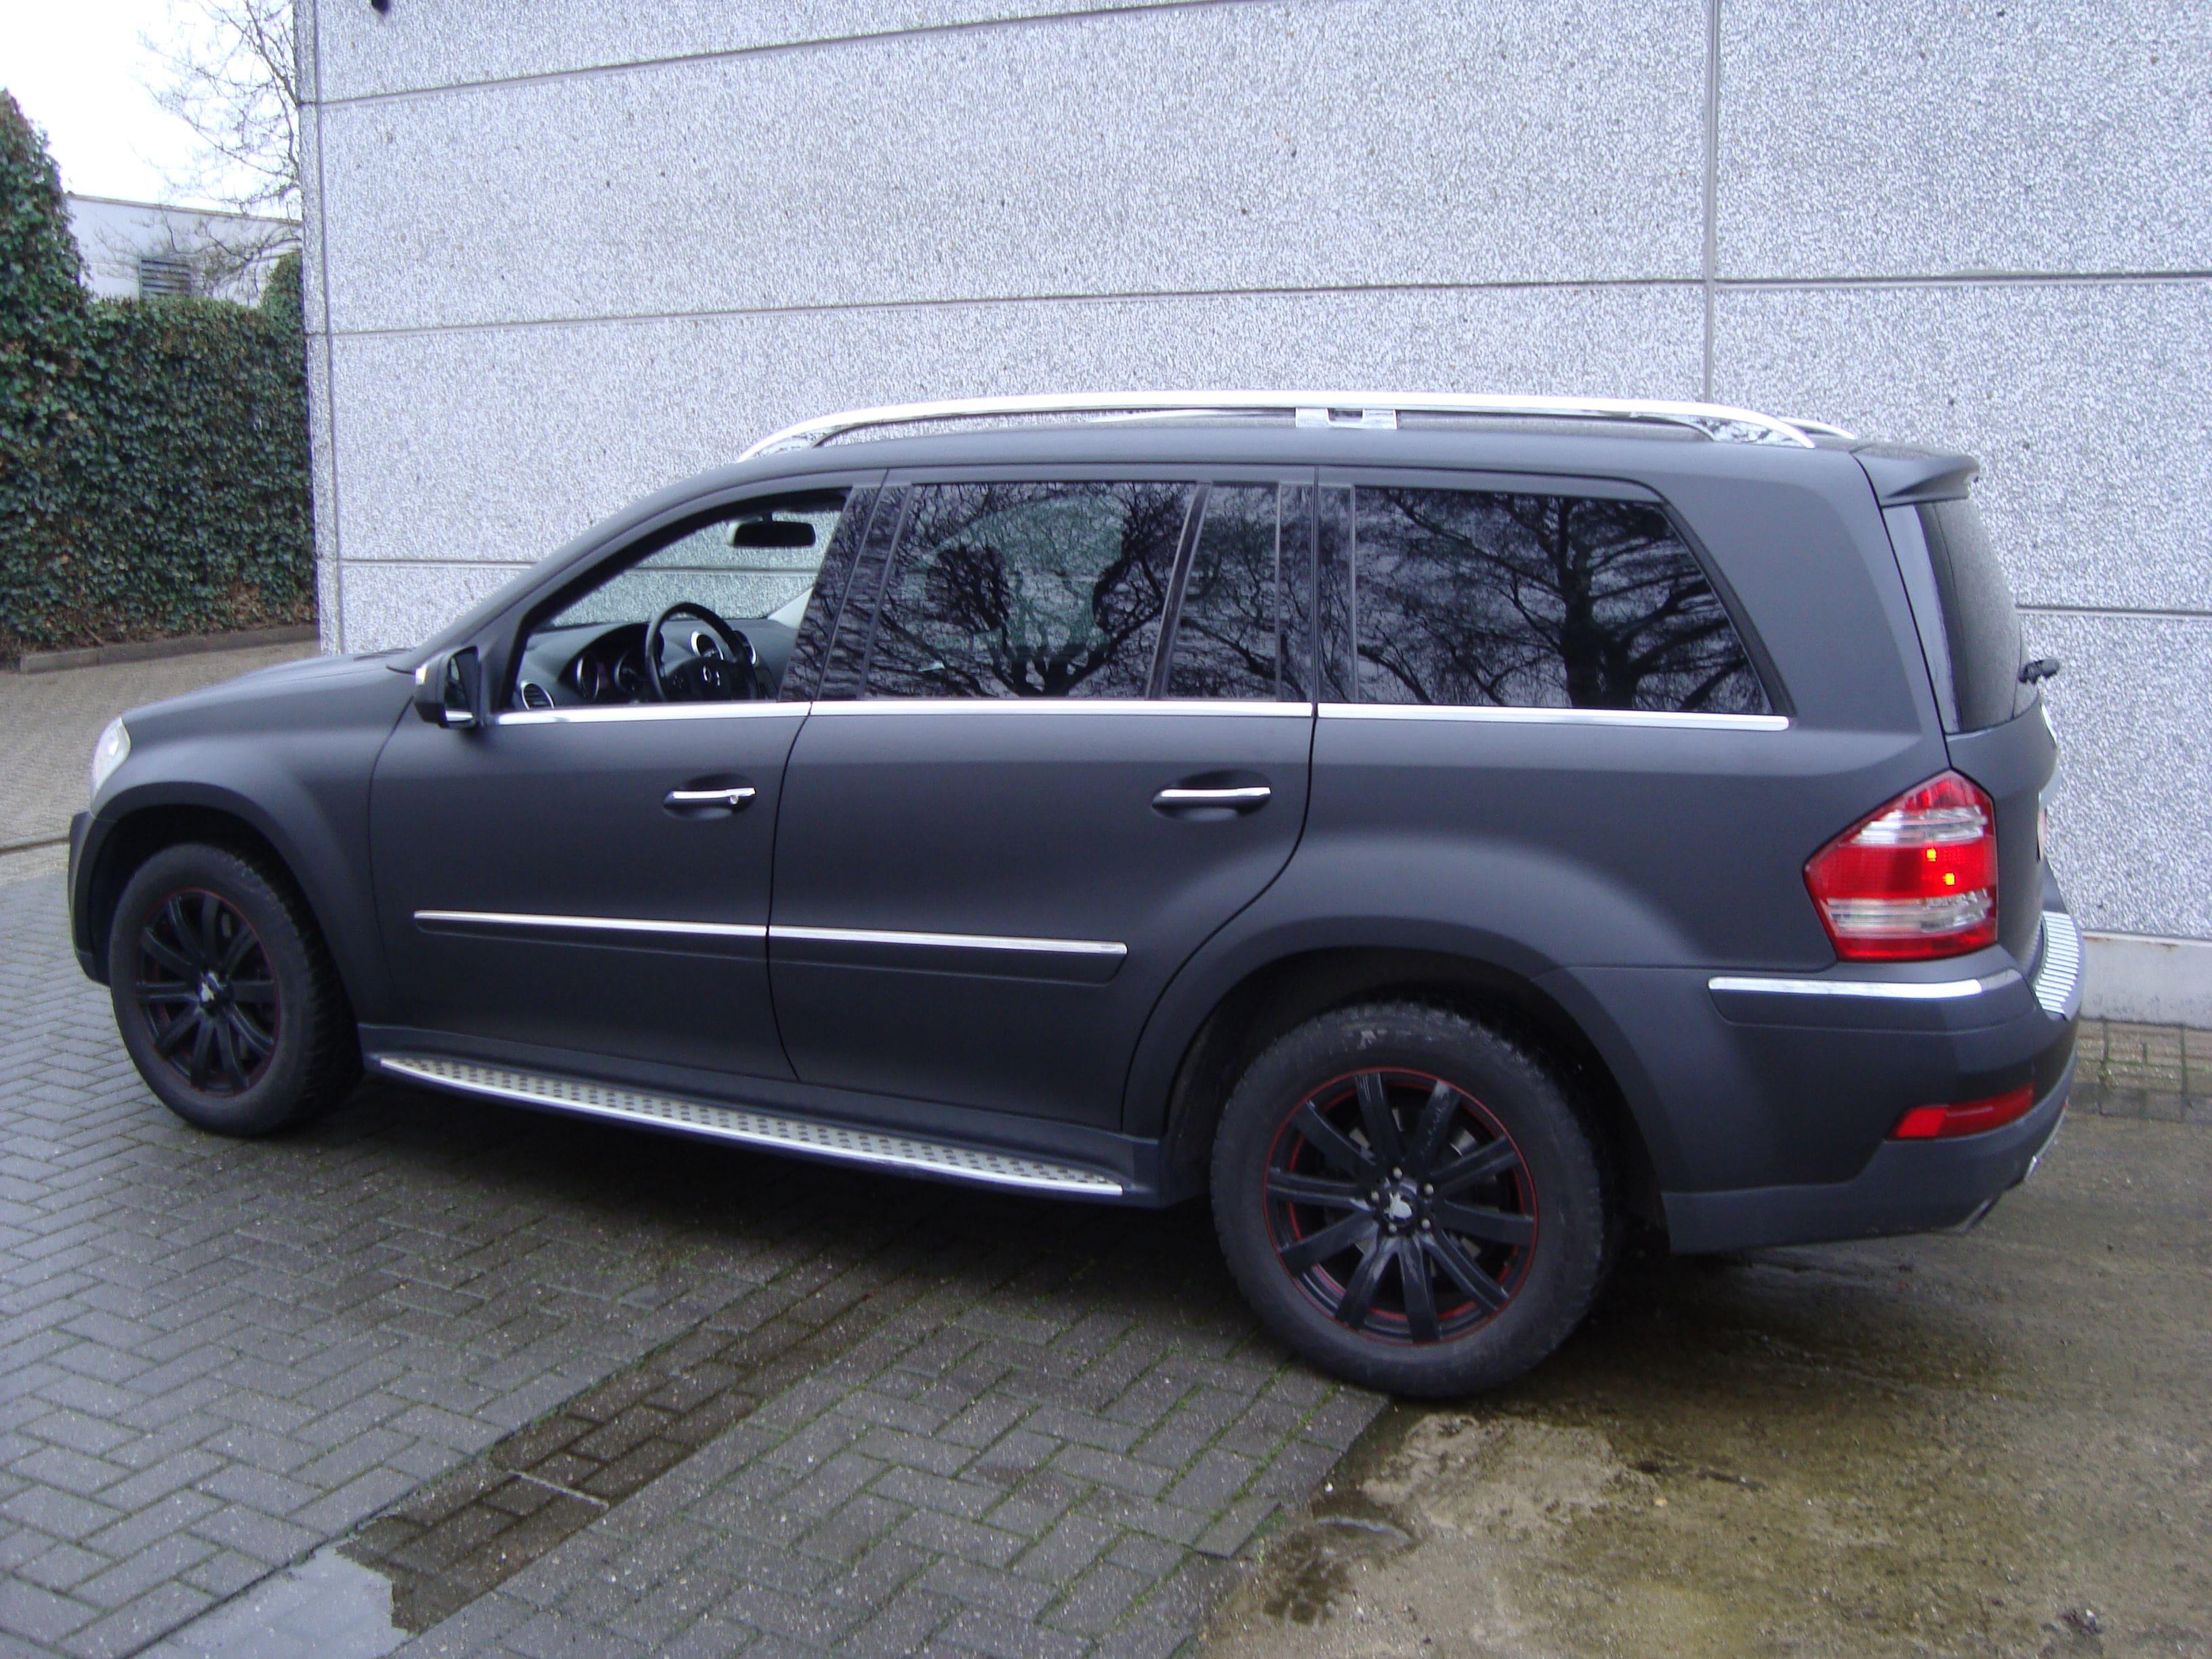 Mercedes GL met Mat Zwarte Wrap, Carwrapping door Wrapmyride.nu Foto-nr:6281, ©2020